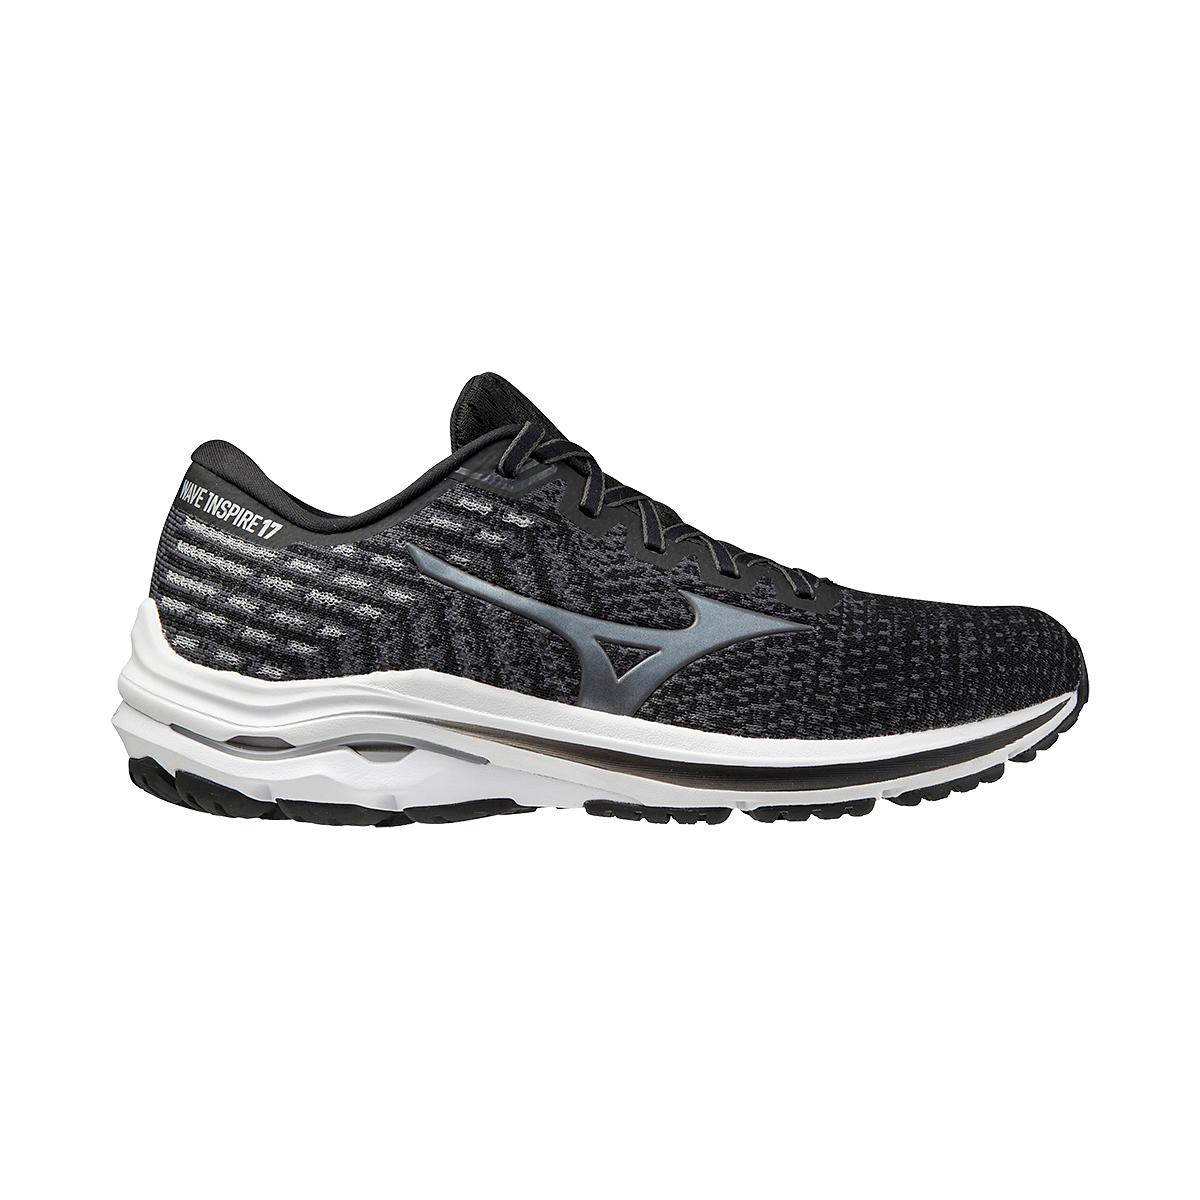 Men's Mizuno Wave Inspire 17 Waveknit Running Shoe - Color: Black/Shade - Size: 7 - Width: Regular, Black/Shade, large, image 1